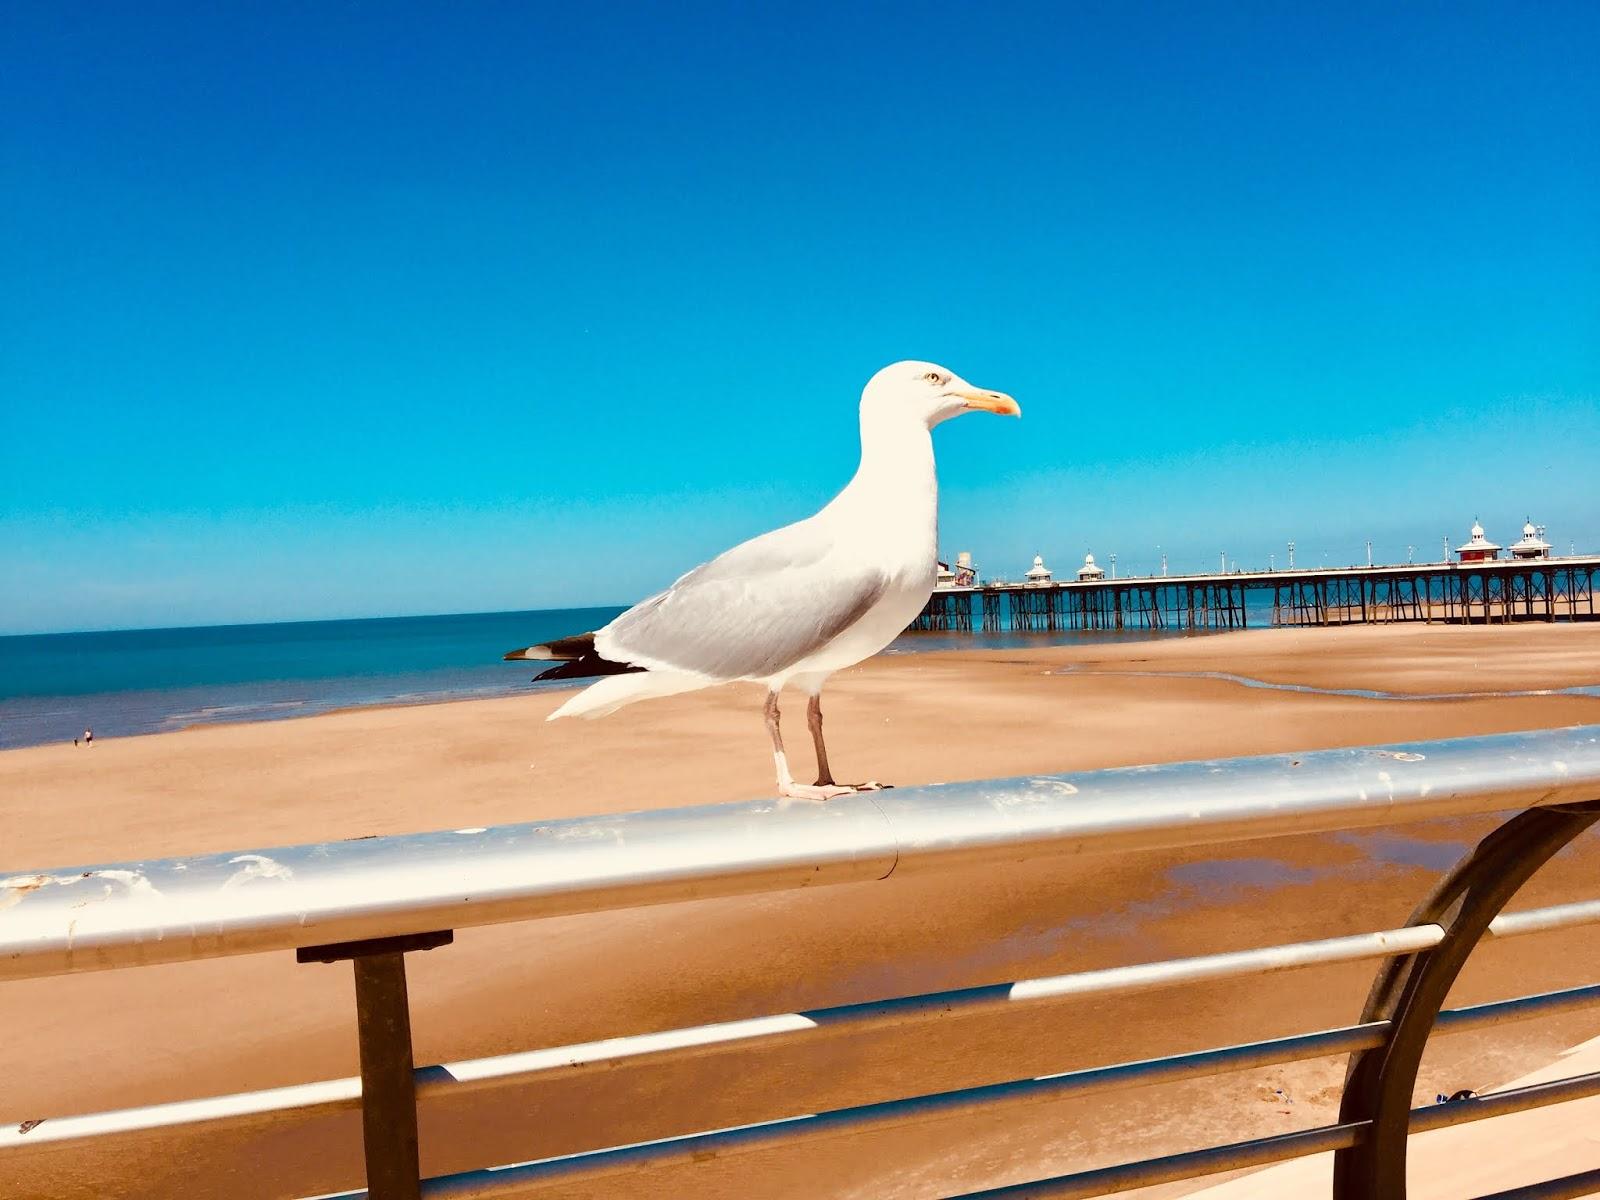 blackpool, seaside, lancashire, staycation, travel, travelling, holiday, summer